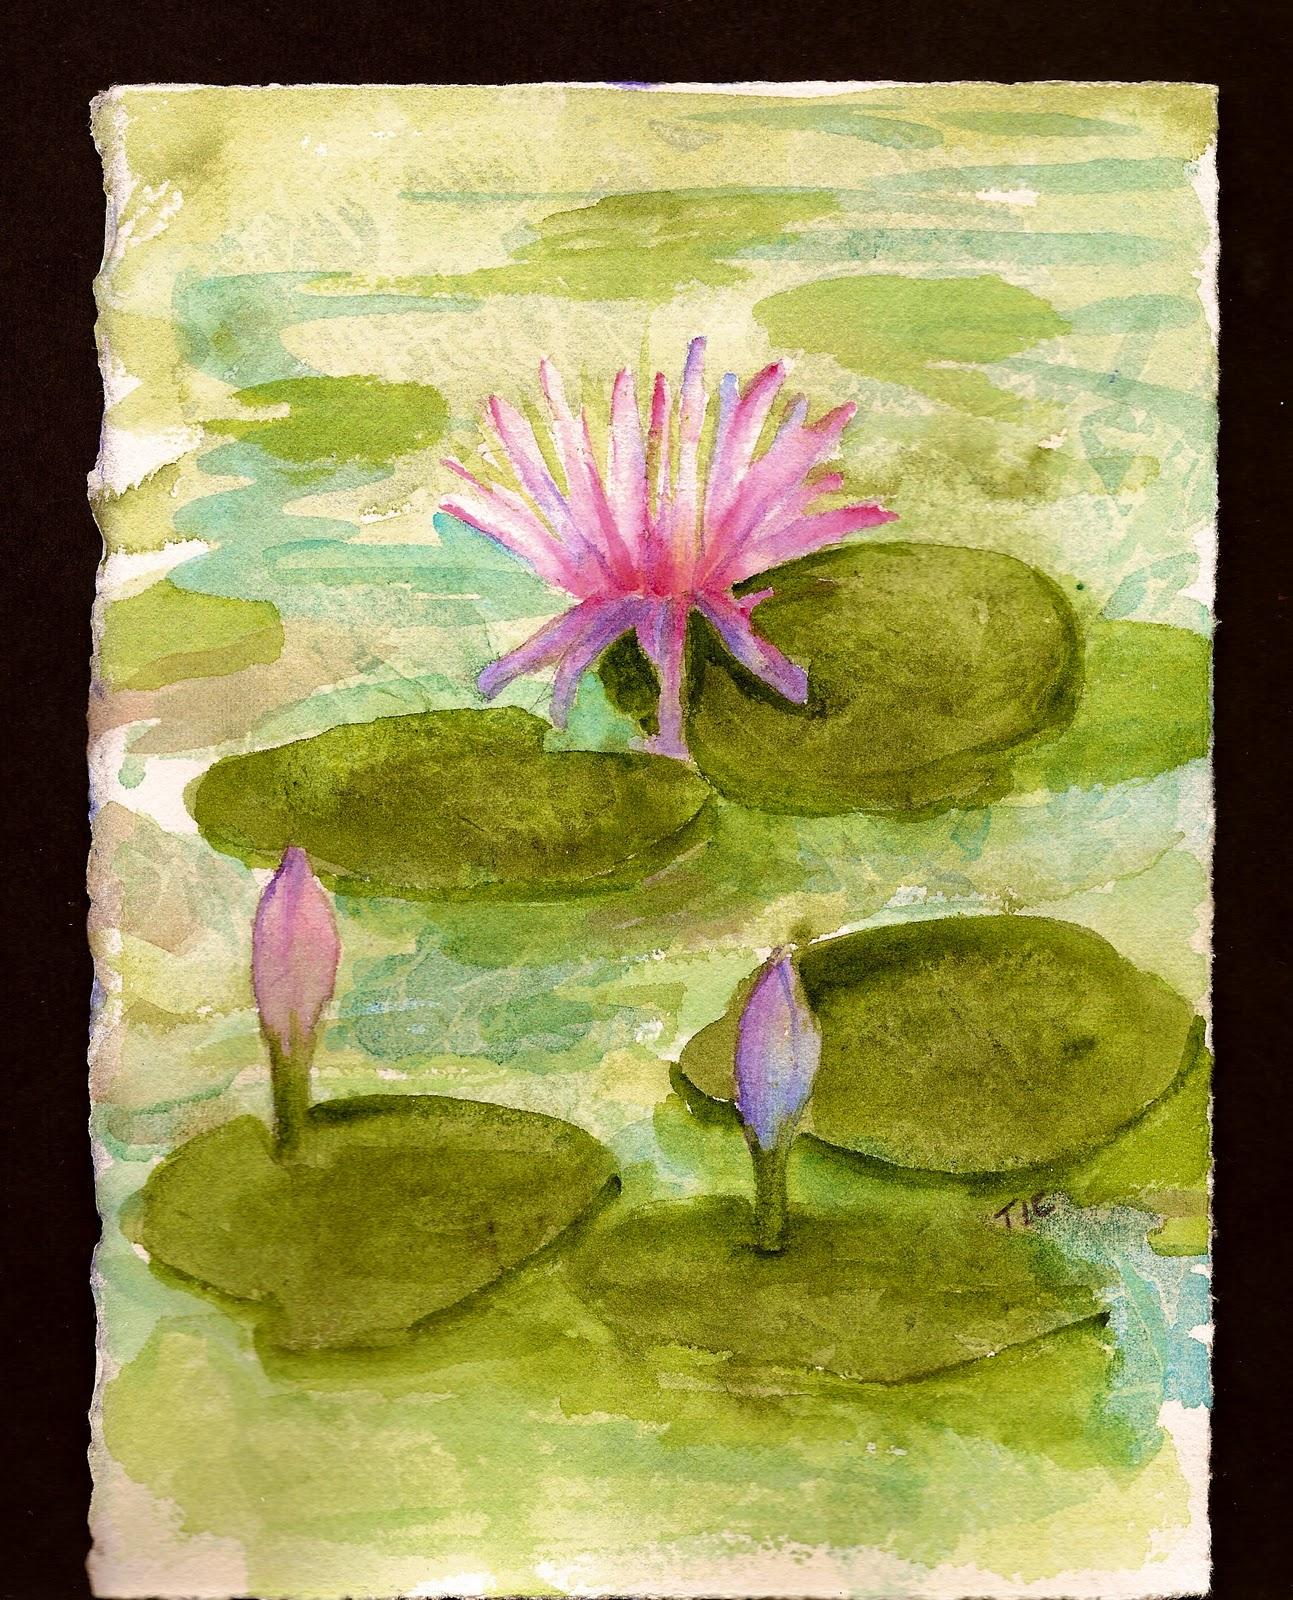 http://2.bp.blogspot.com/_An2lnAQUBNg/THLatBk2B6I/AAAAAAAAMww/TUsxK-GJhbg/s1600/w+lily.jpg